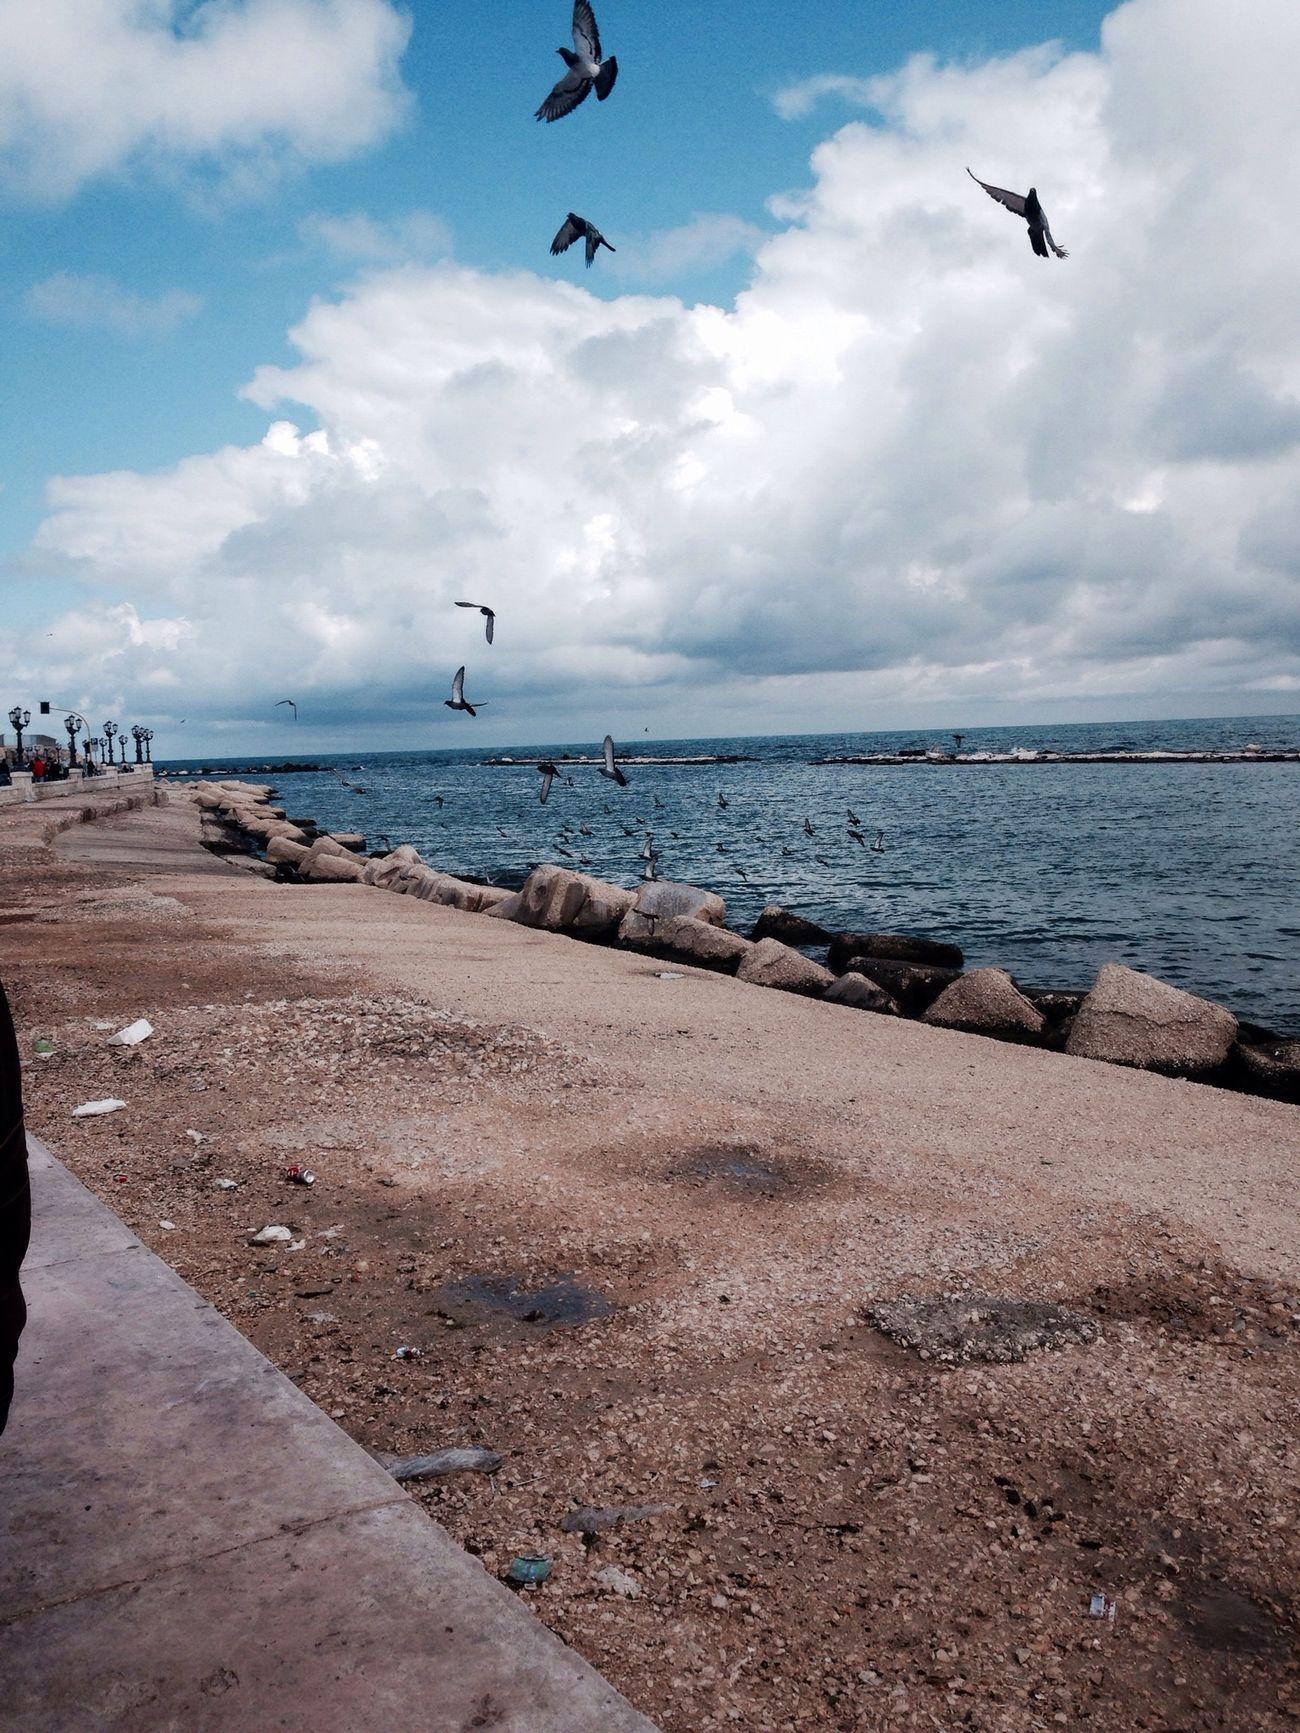 All you need. Capturing Freedom Fresh Air Sea Birds